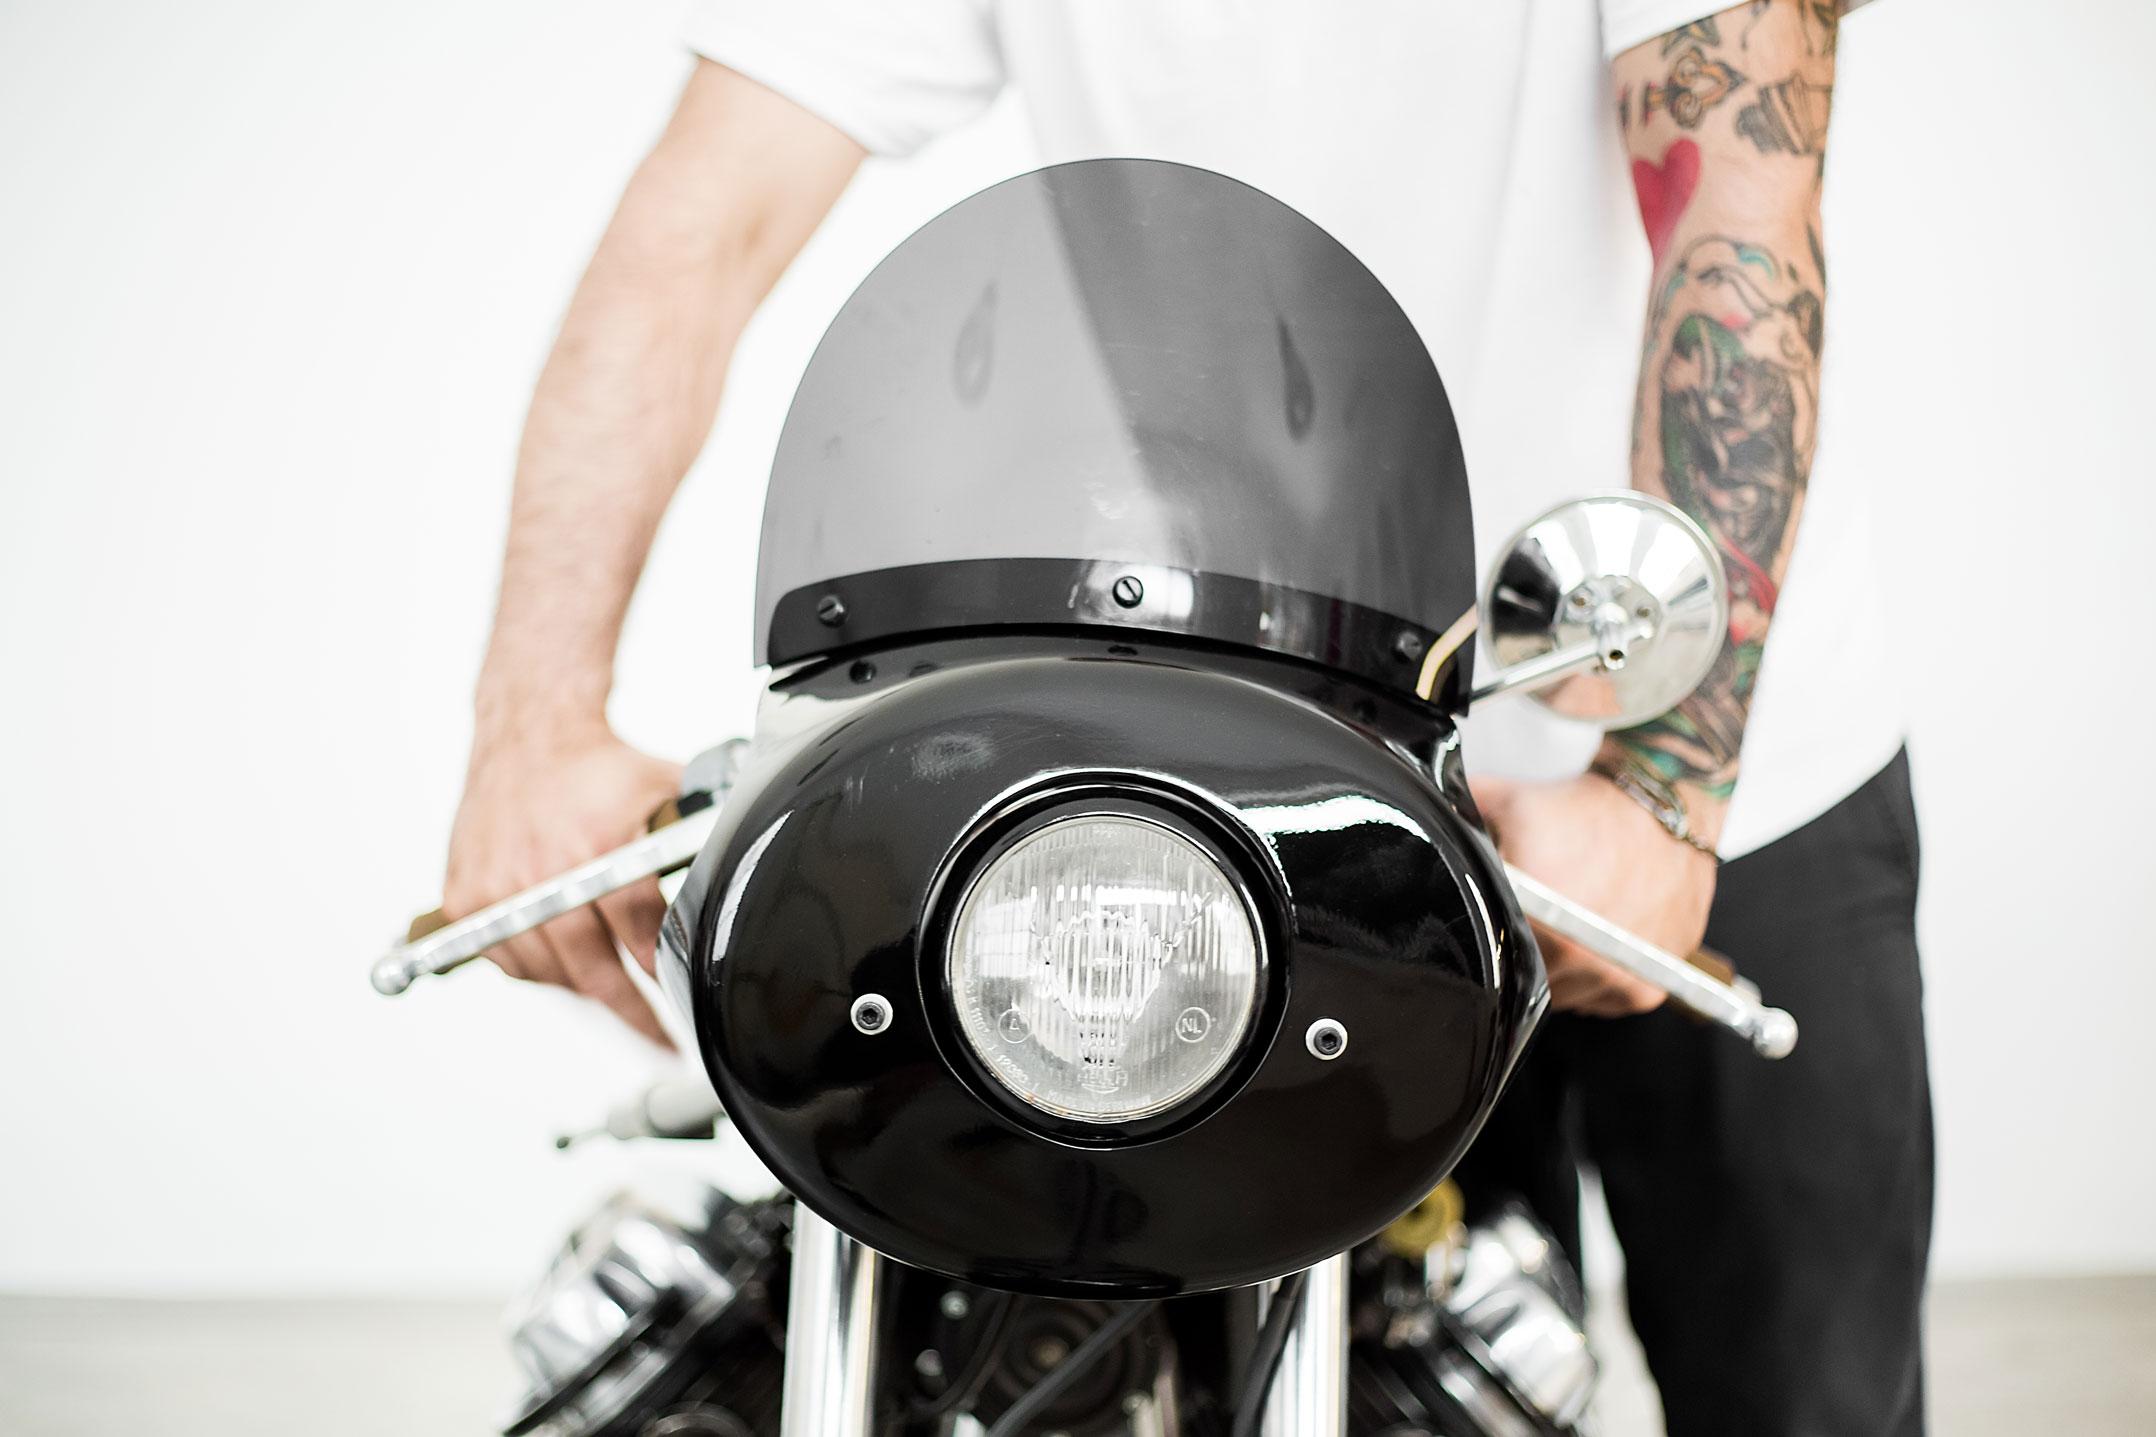 Moto Guzzi, Route Fiere, Vintage Motorcycle, Cafe Racer, Moto Guzzi V7